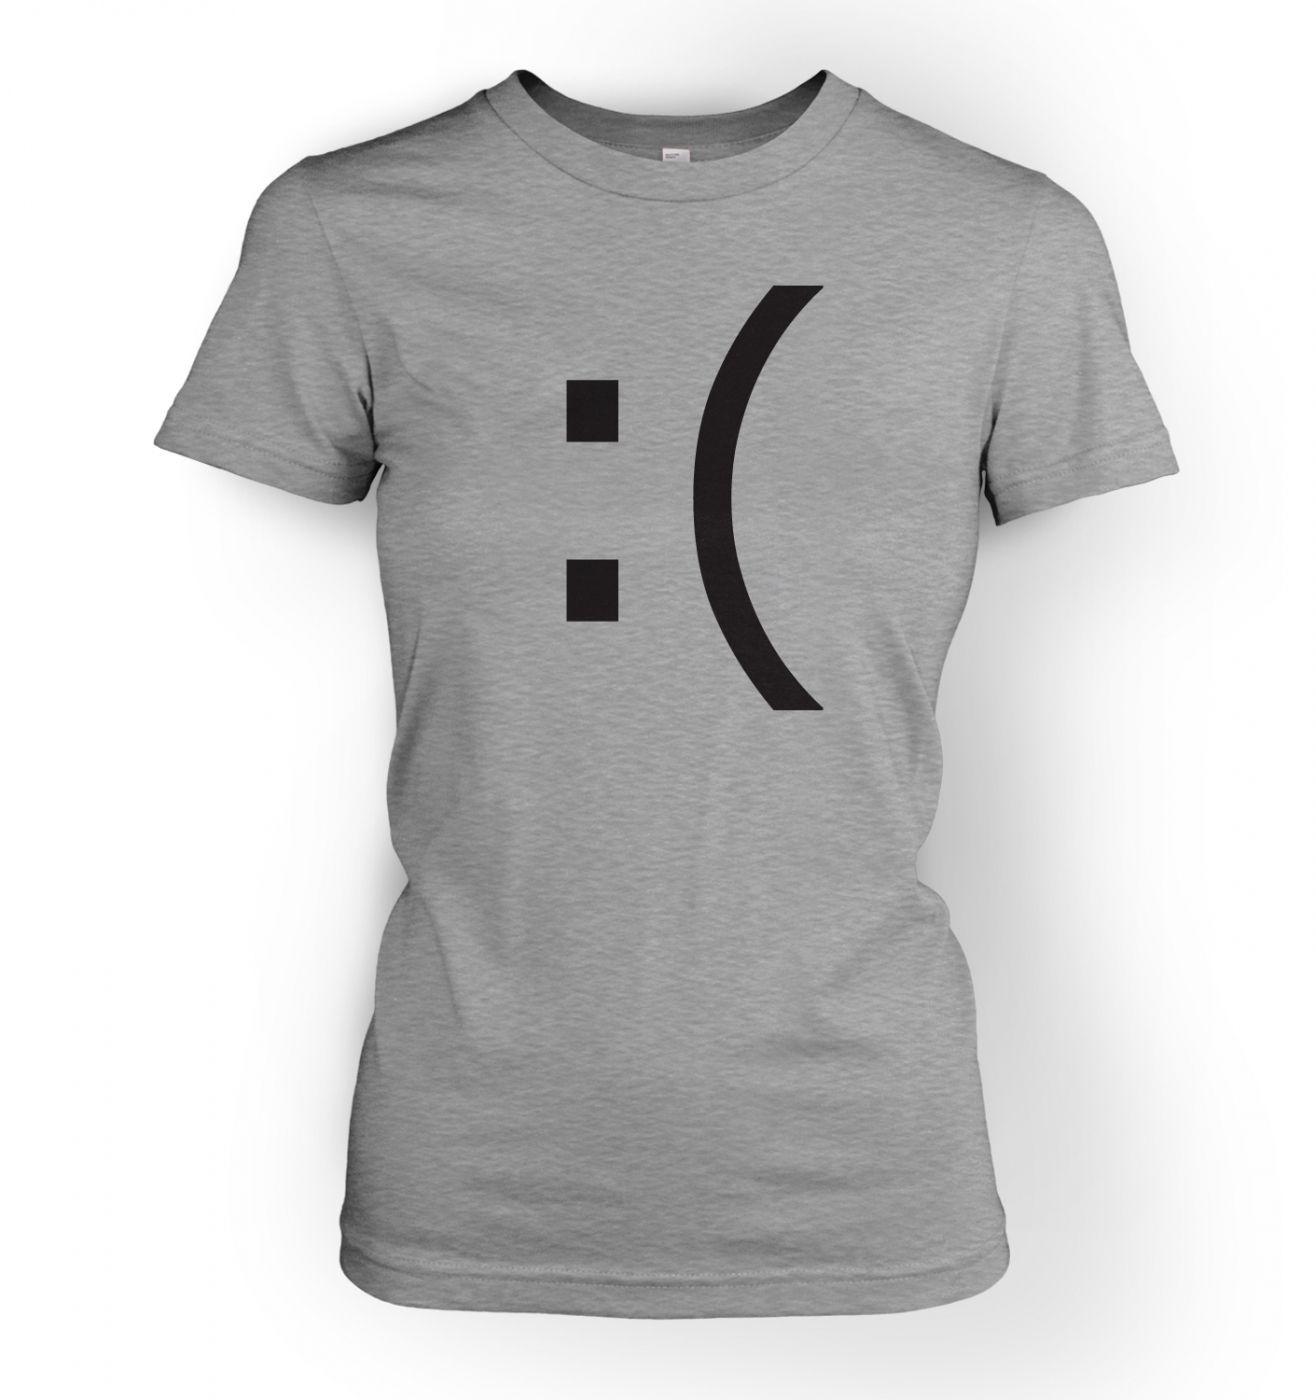 Women's Sad Emoticon t-shirt